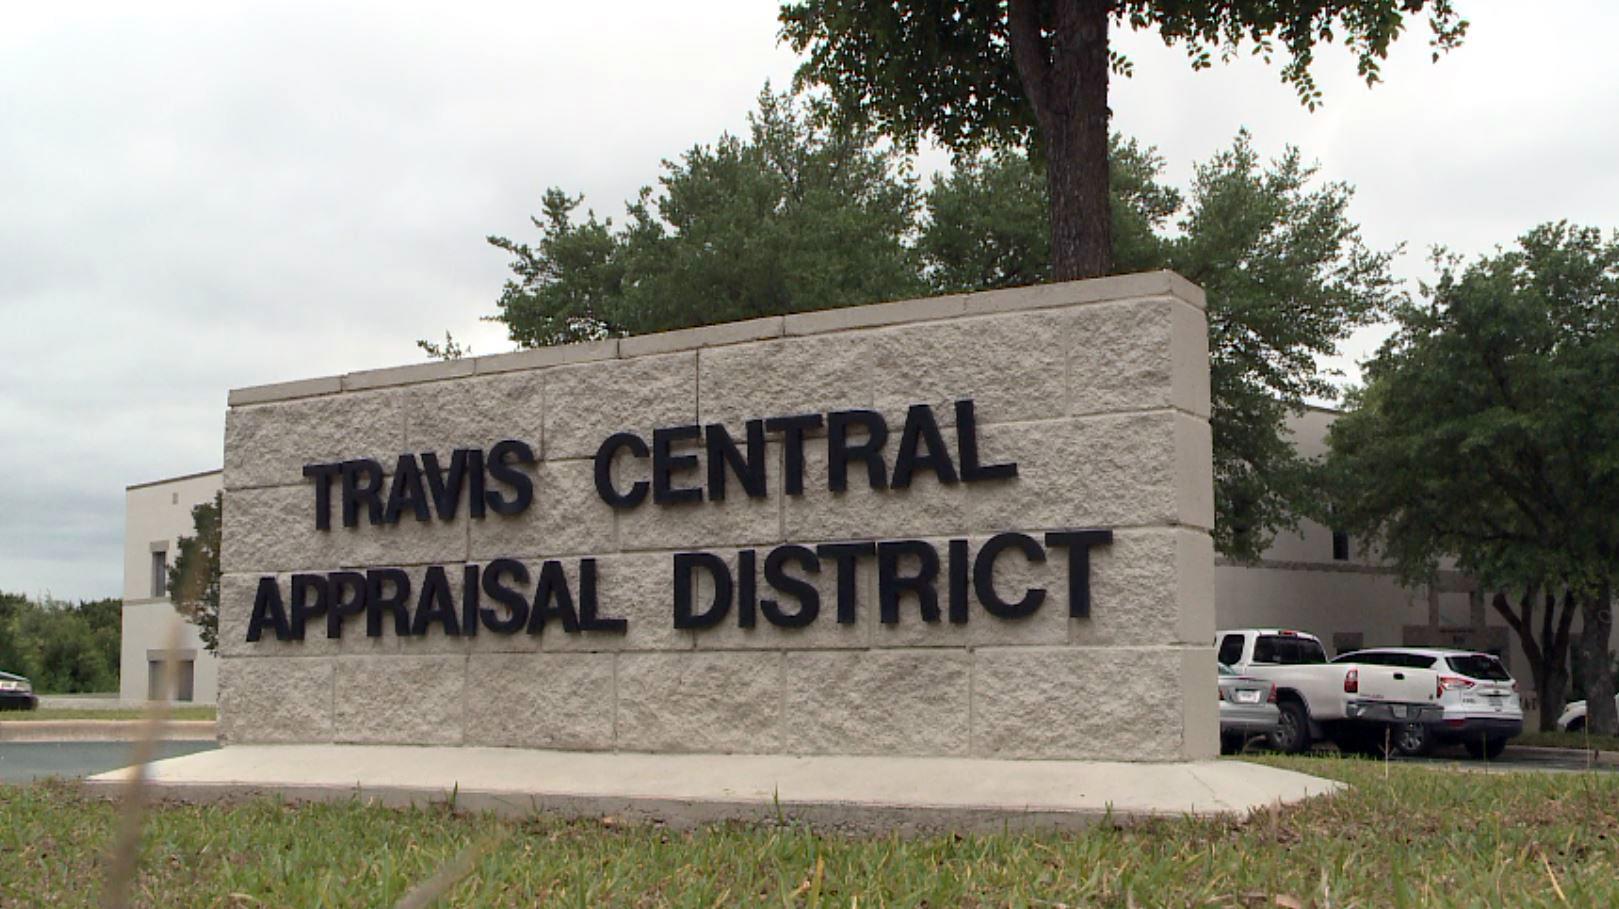 travis central appraisal district_478905